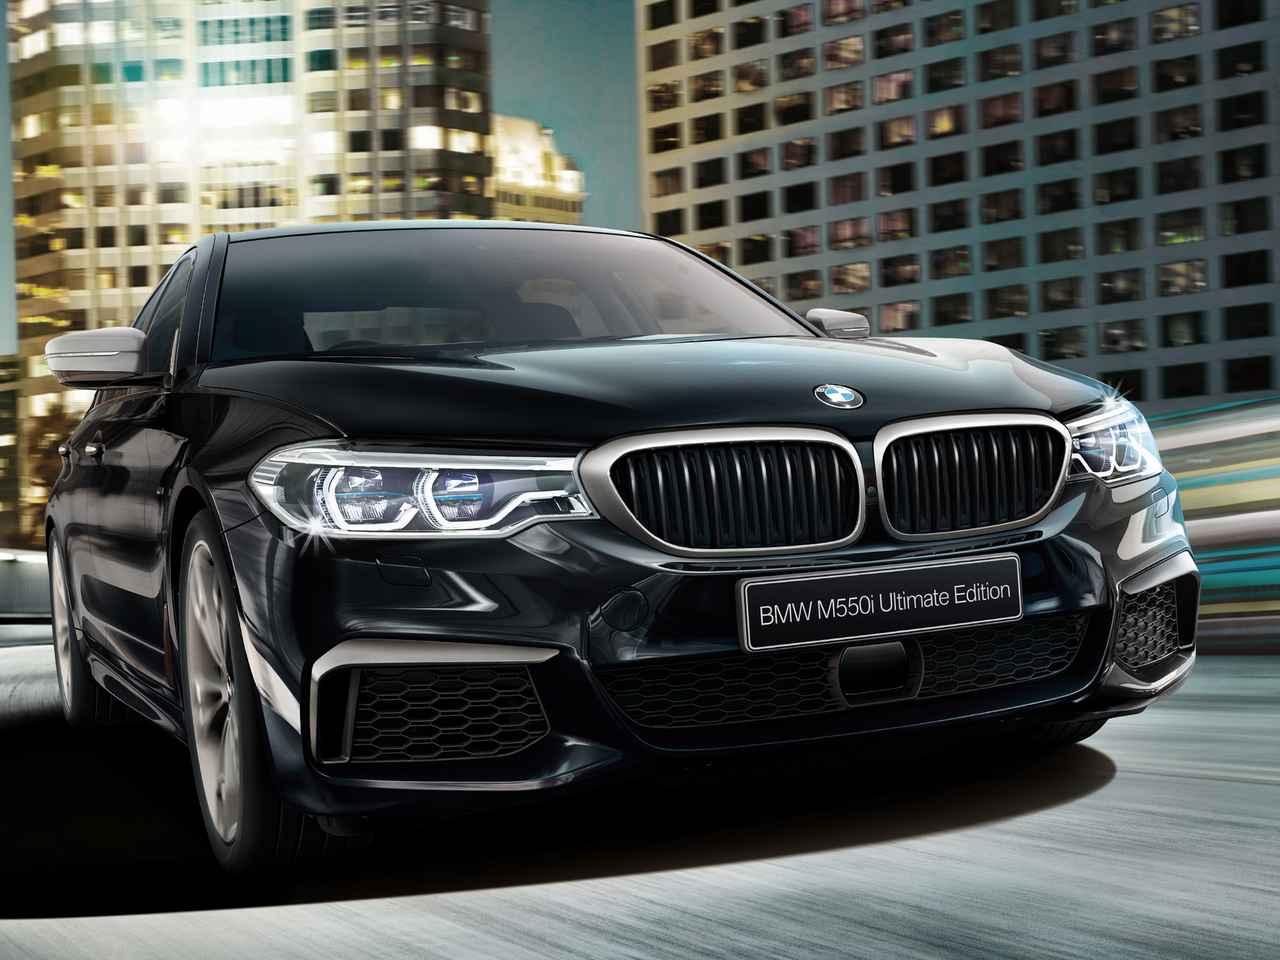 BMWがM550i xDriveアルティメットエディション発売。新型5シリーズ初のMパフォーマンスモデル